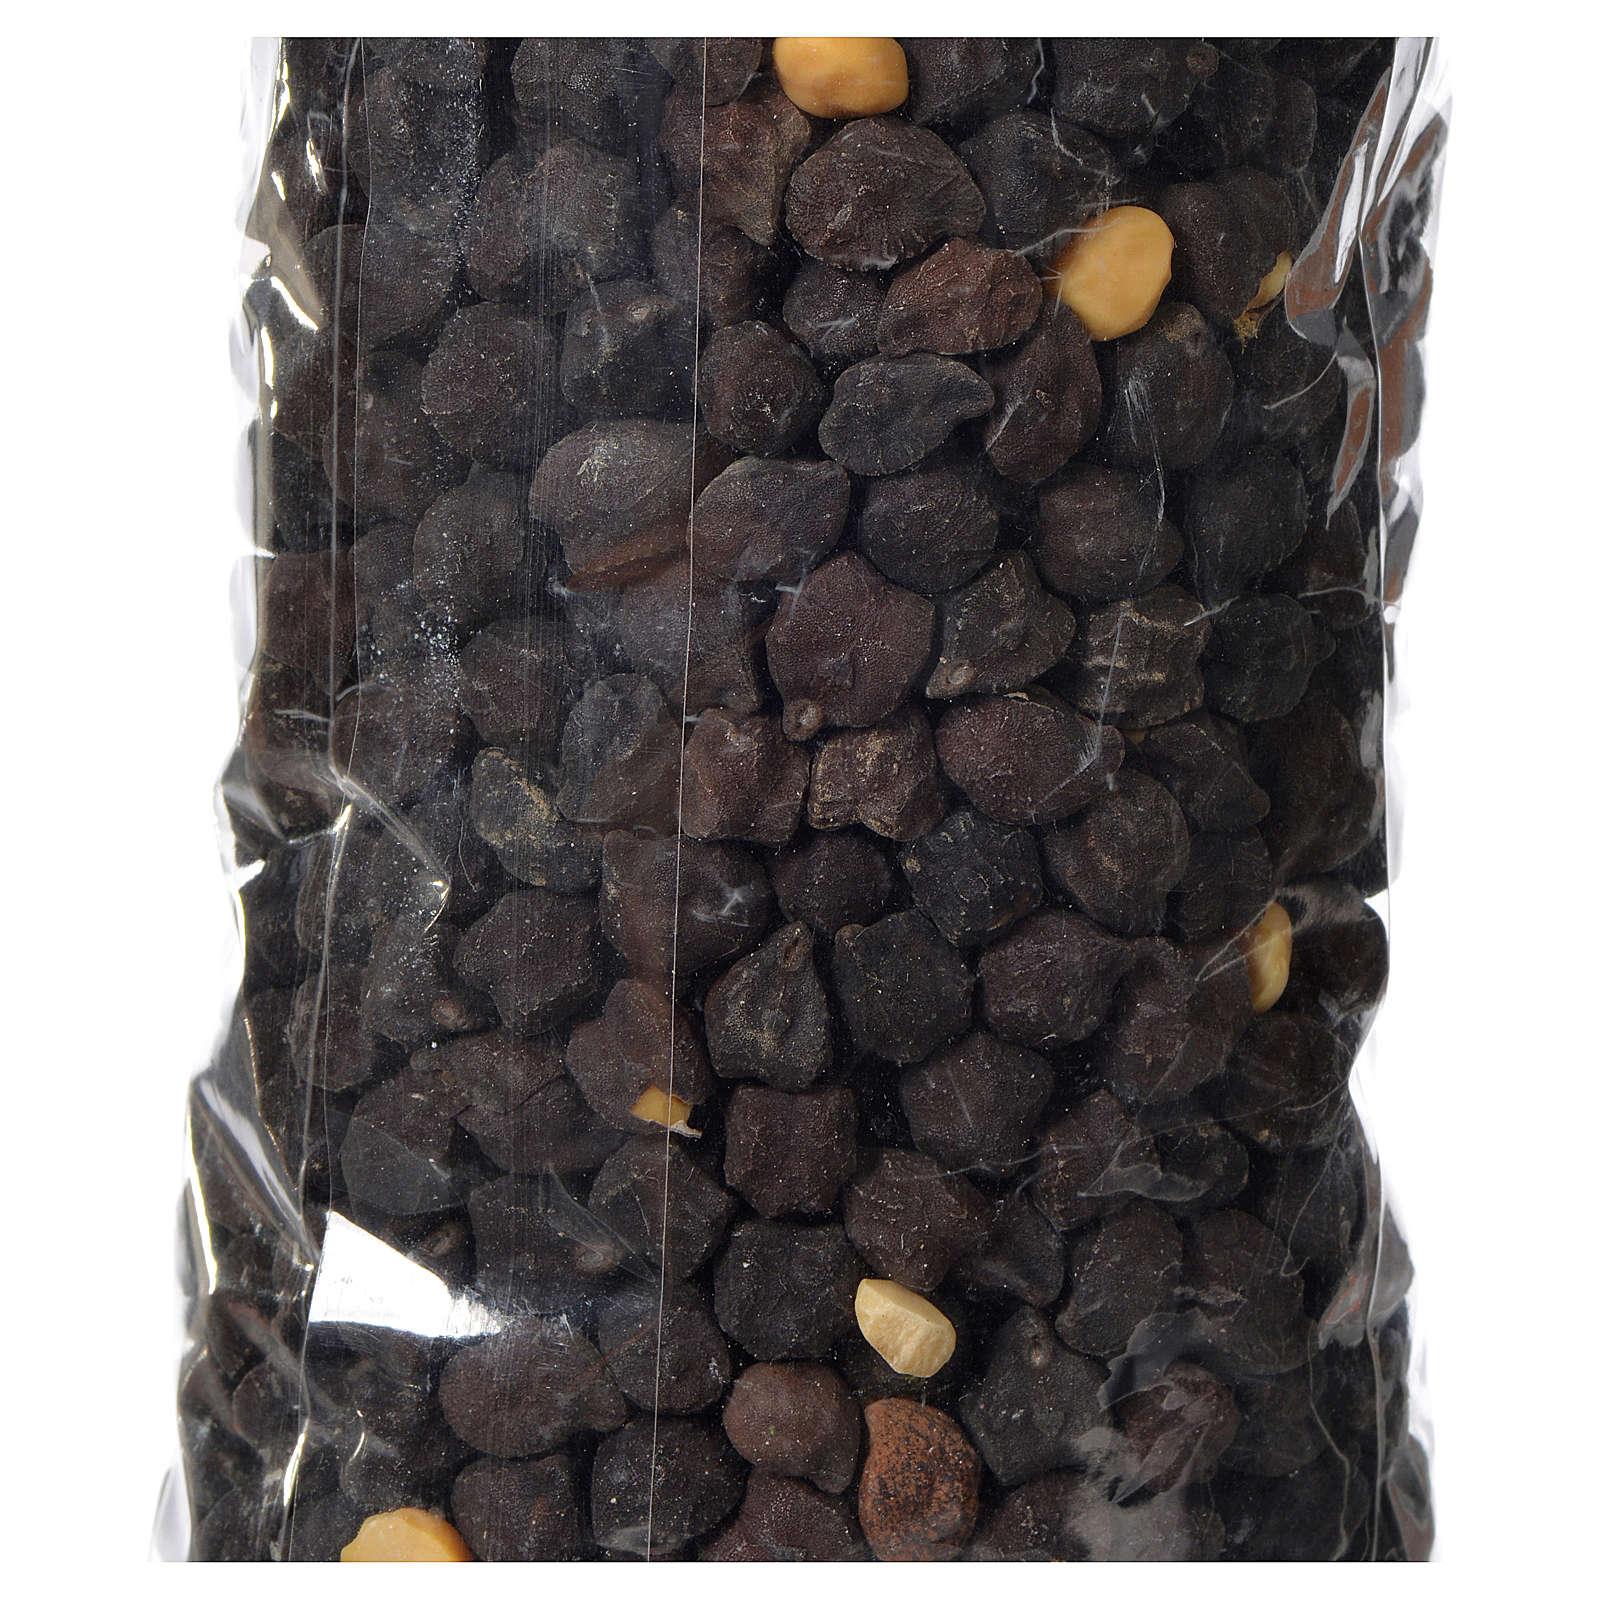 Cece nero Siloe 450 gr 3